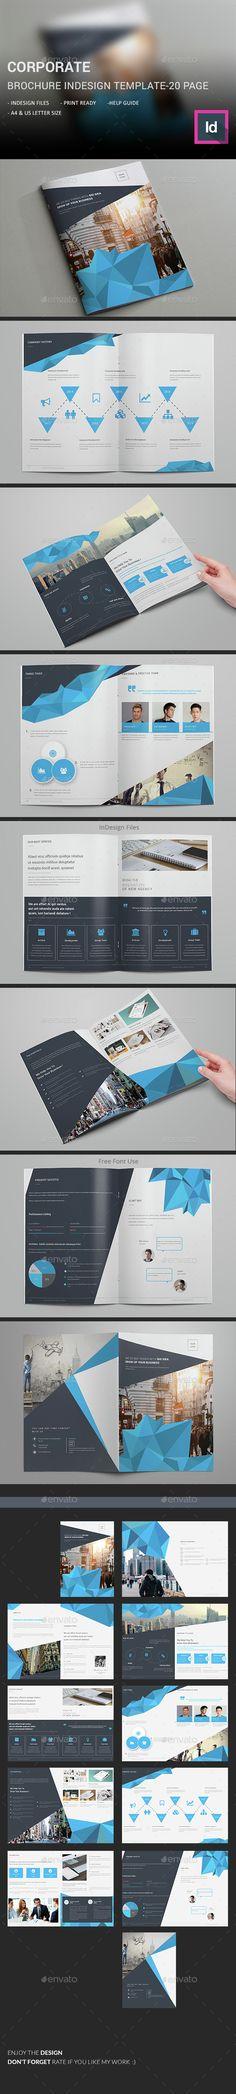 Living Real Estate Brochure Template PSD PRINT Designs - technology brochure template